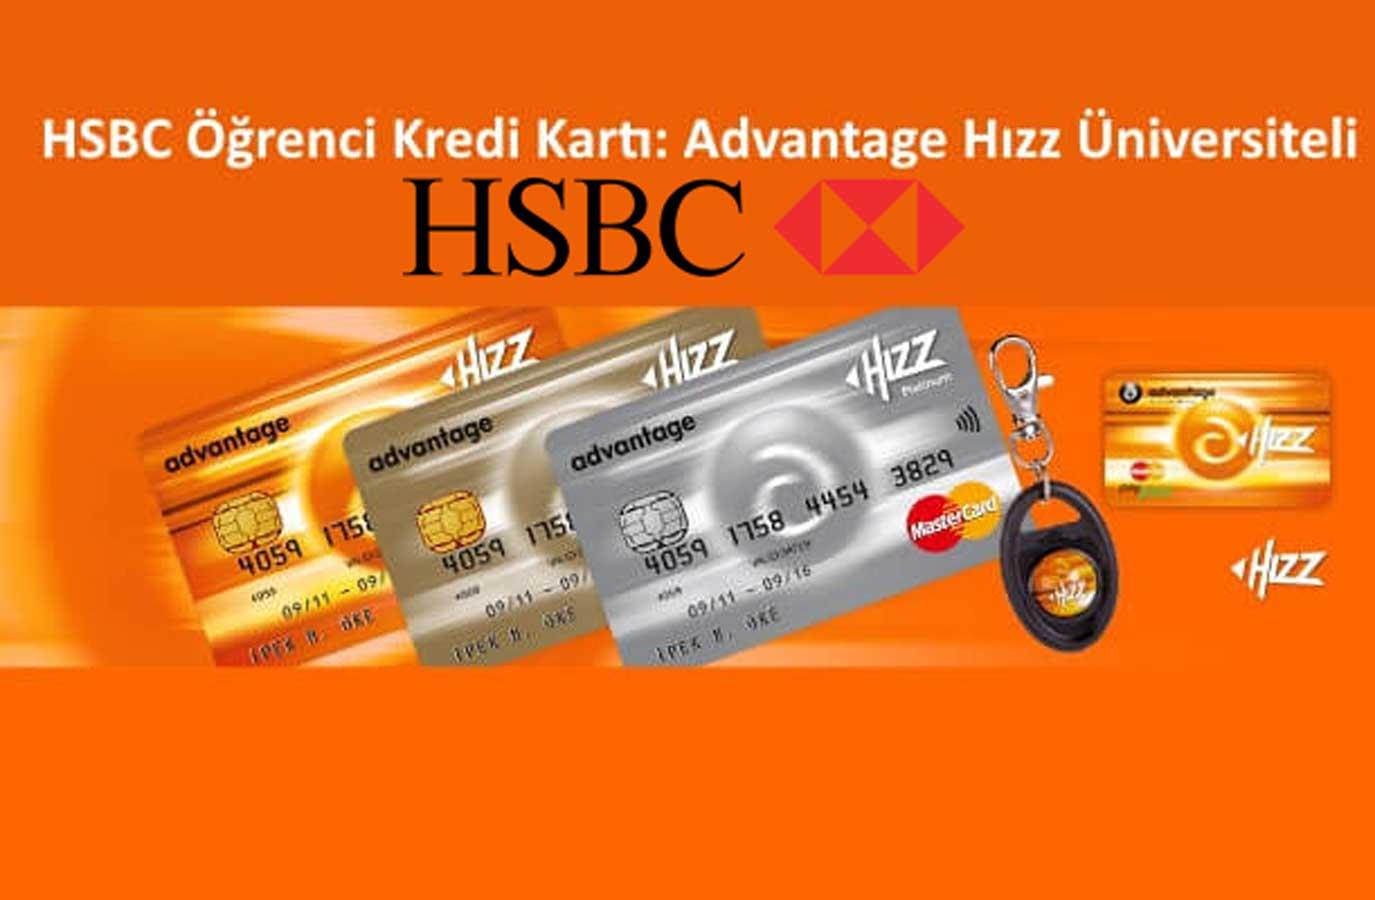 HSBC üniversiteli kart